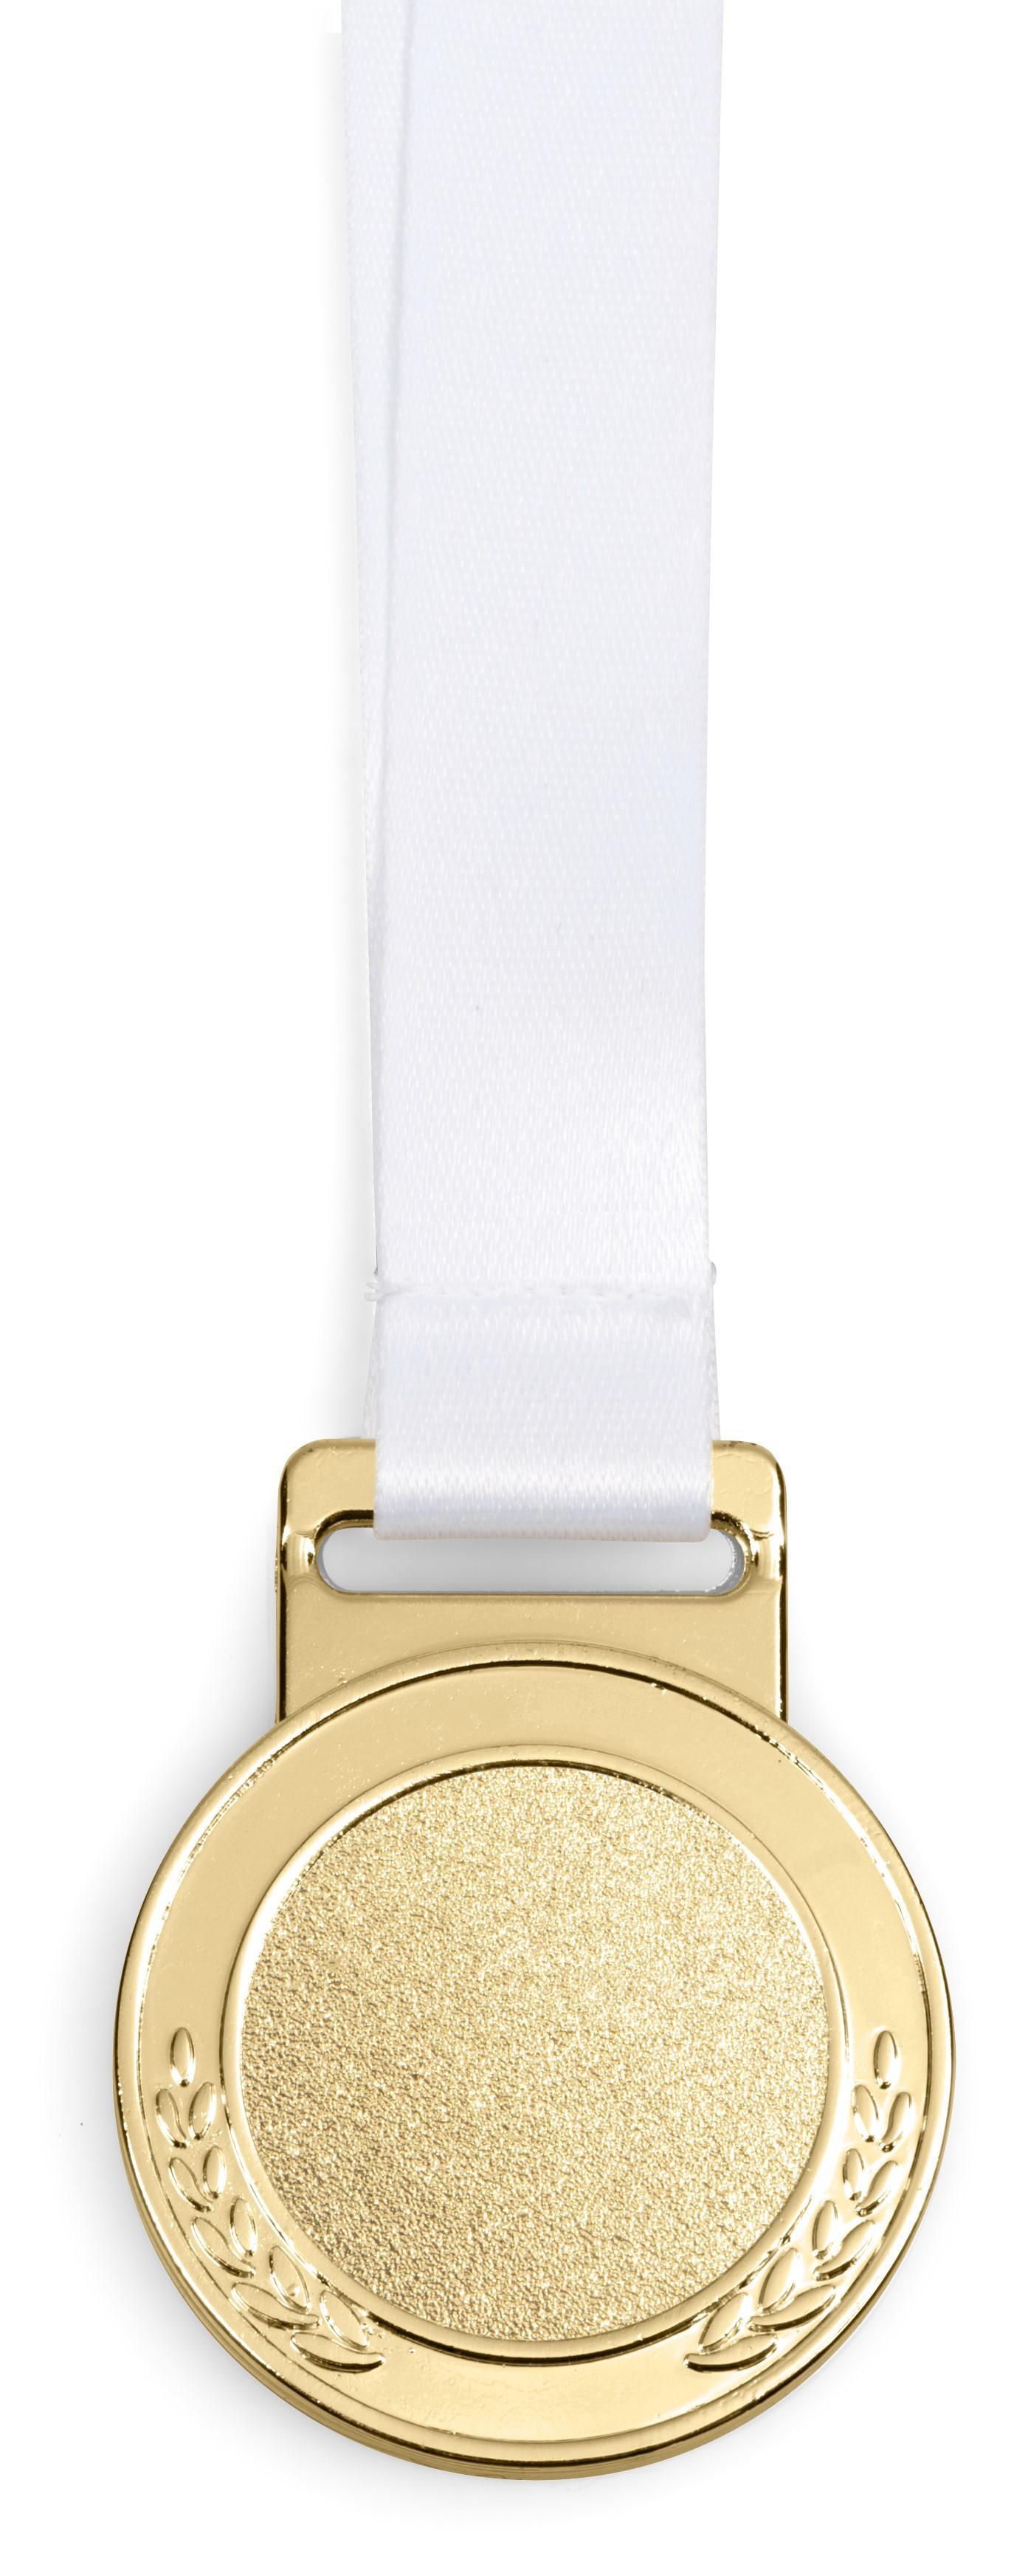 Achiever Medal